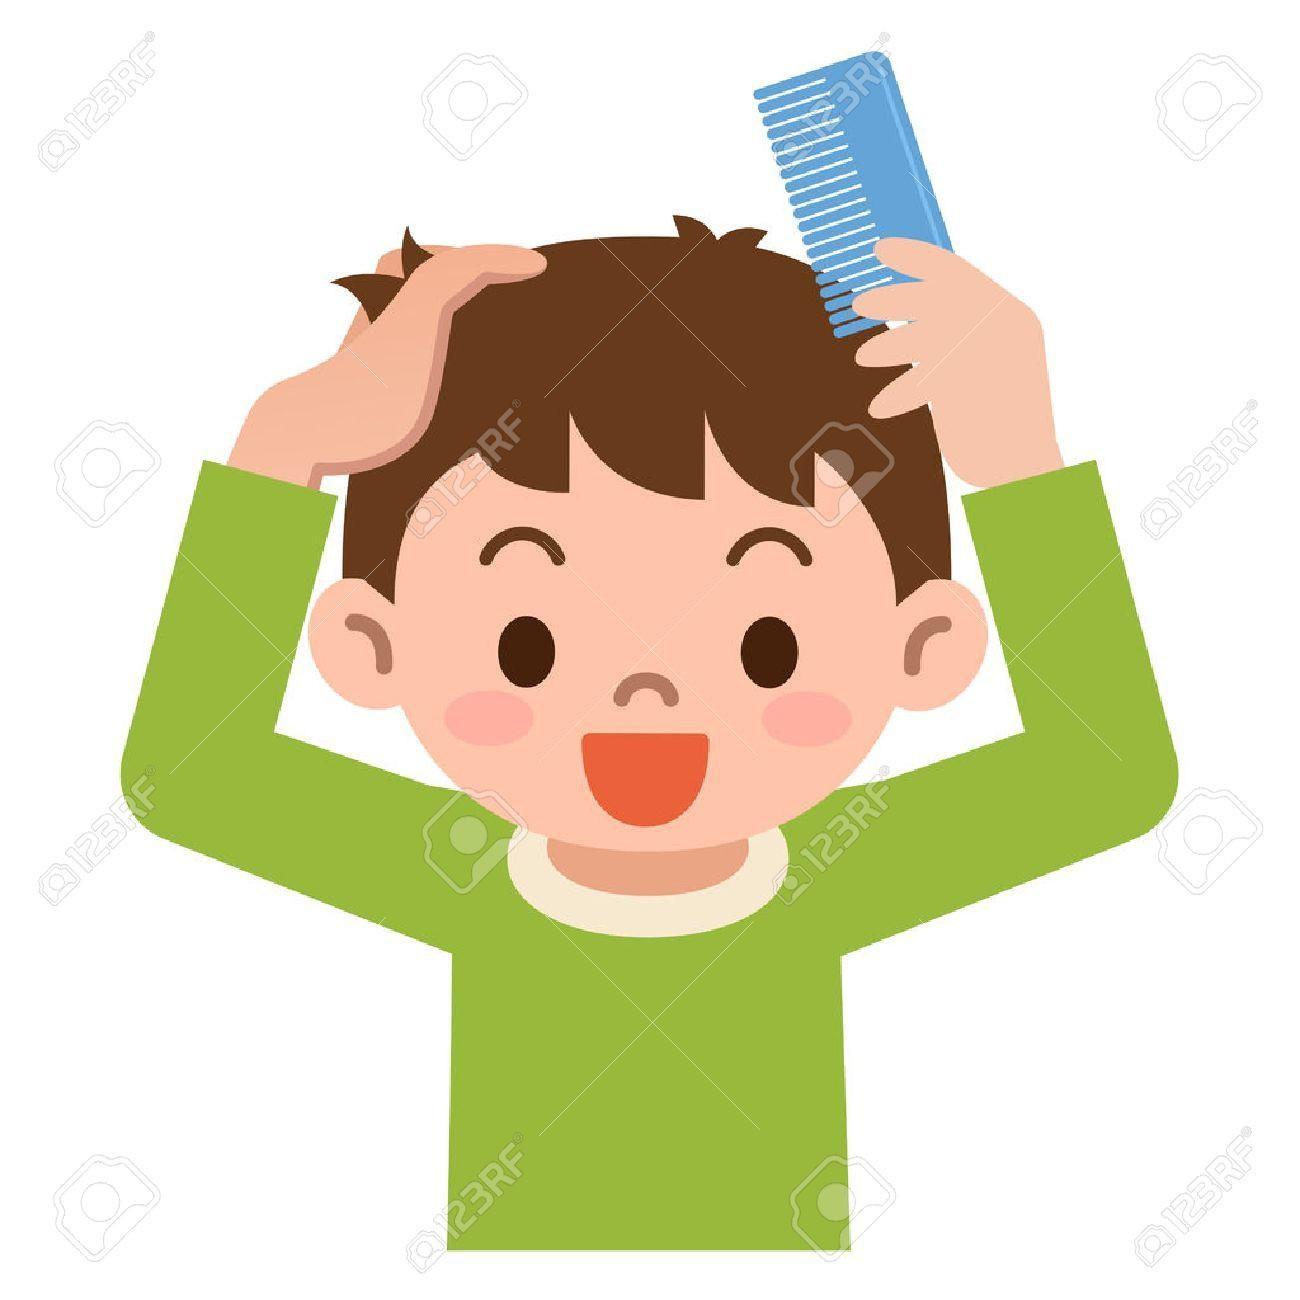 Brushing hair korhek org. Brush clipart boy